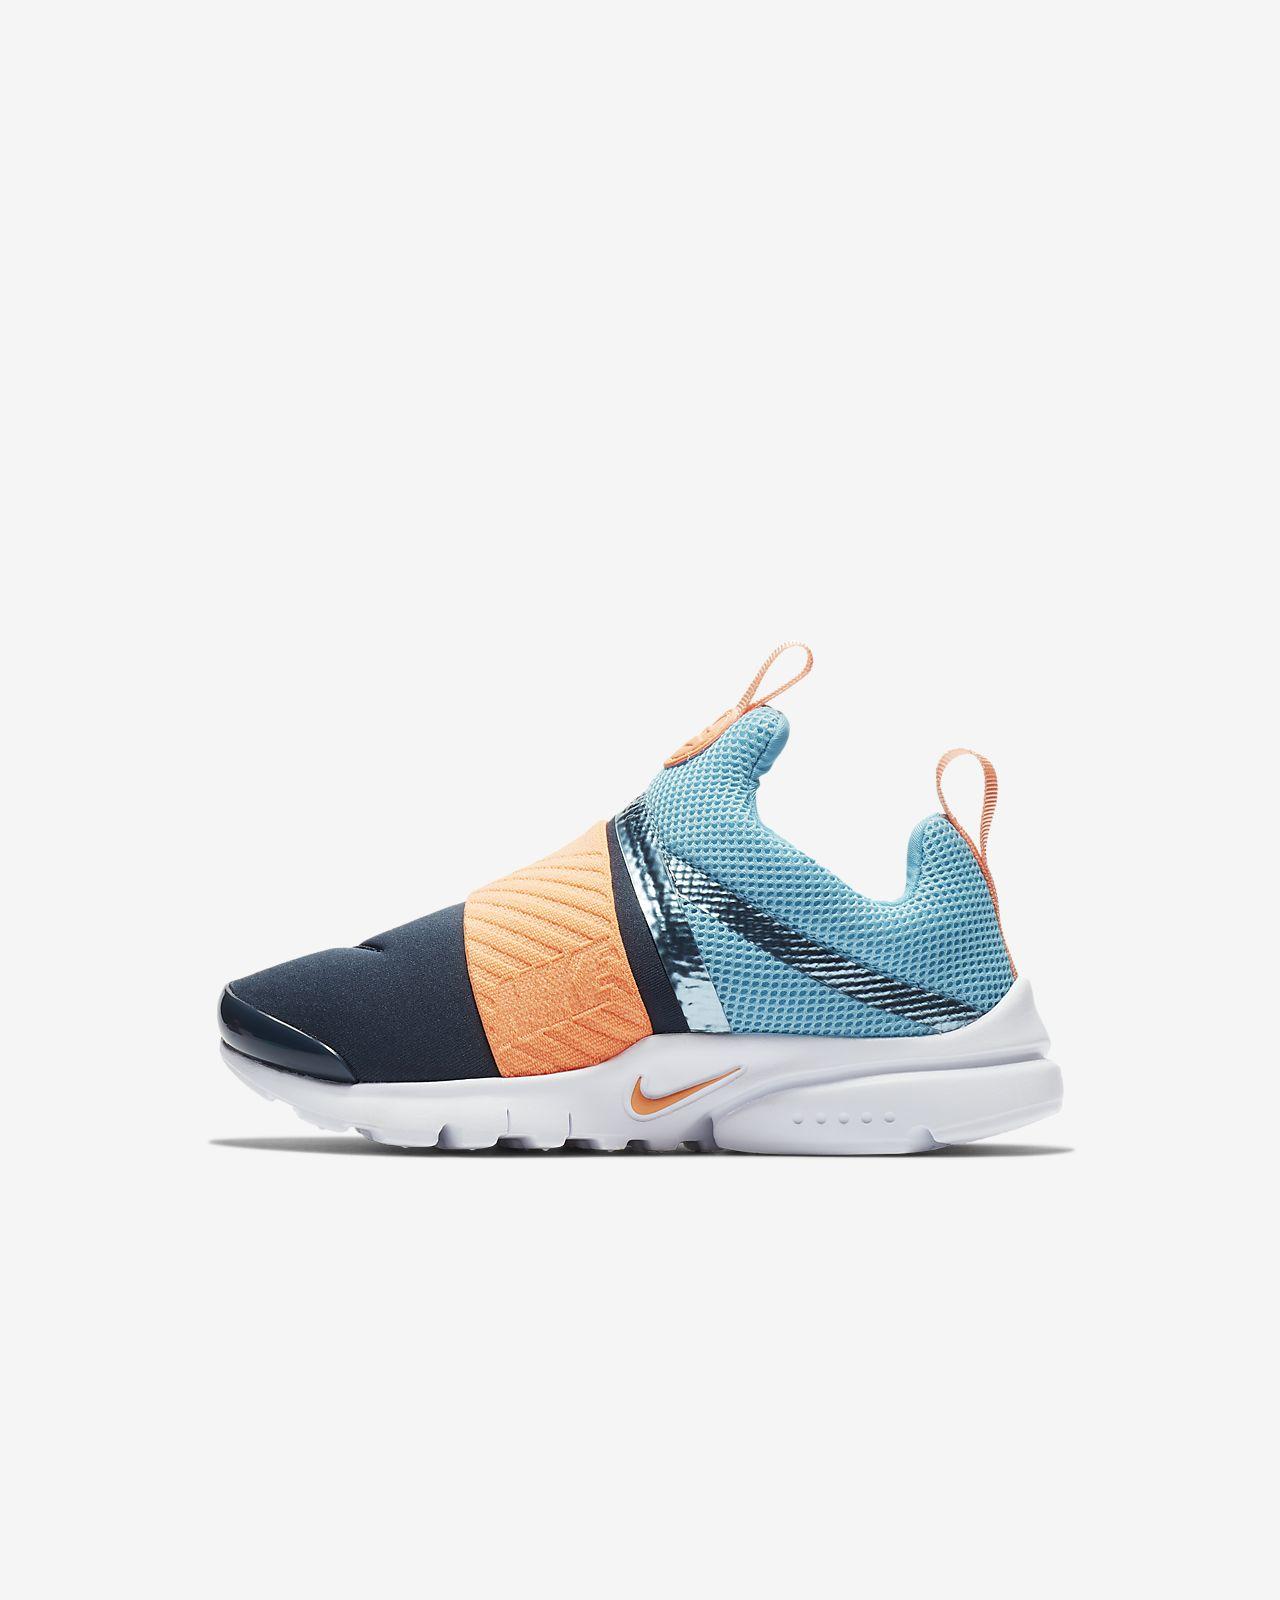 buy popular 6a74c f6c83 ... Nike Presto Extreme Little Kids Shoe